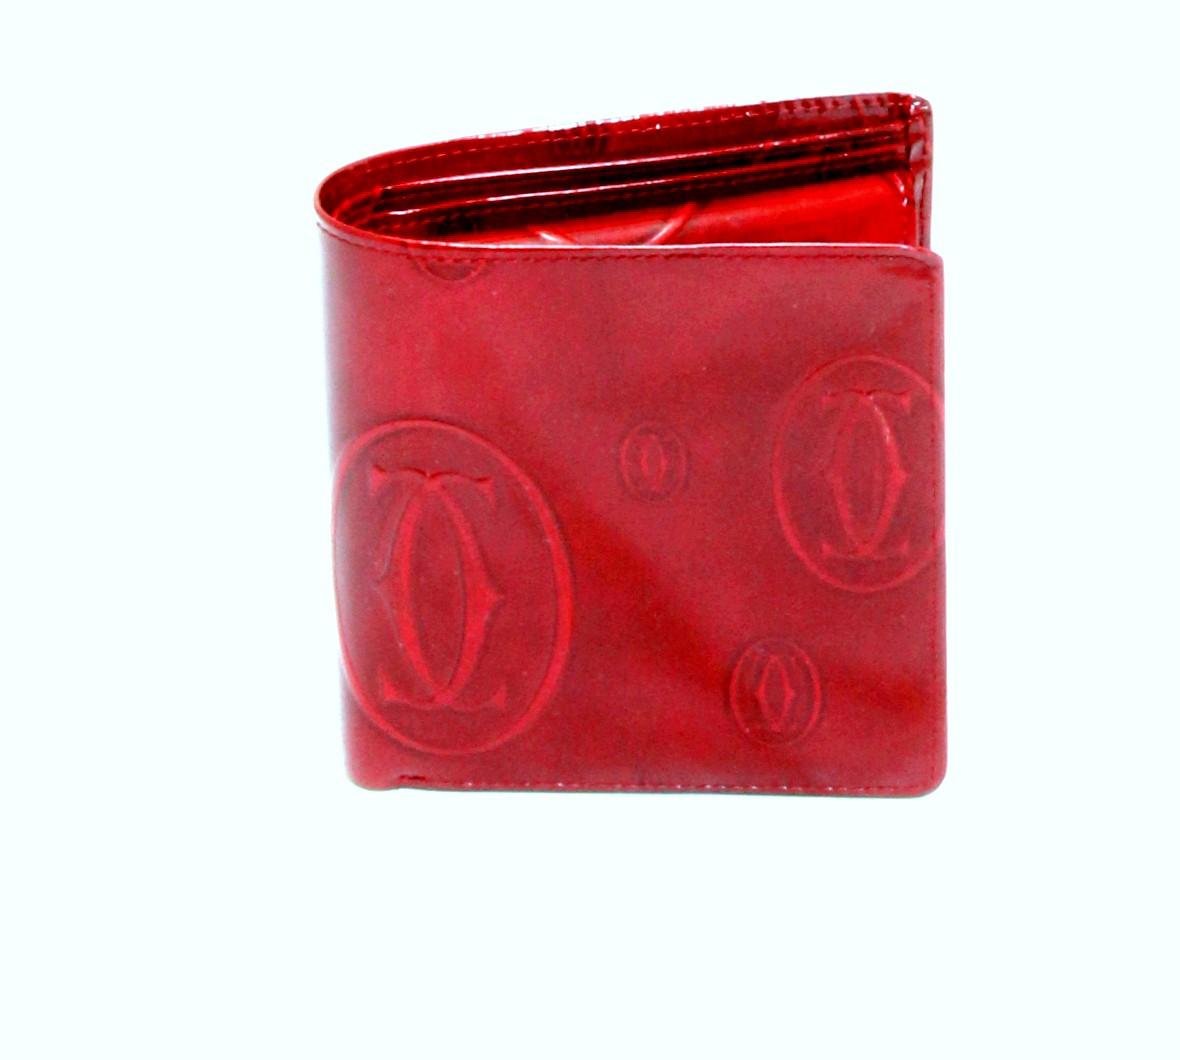 Cartier Wallet - Red